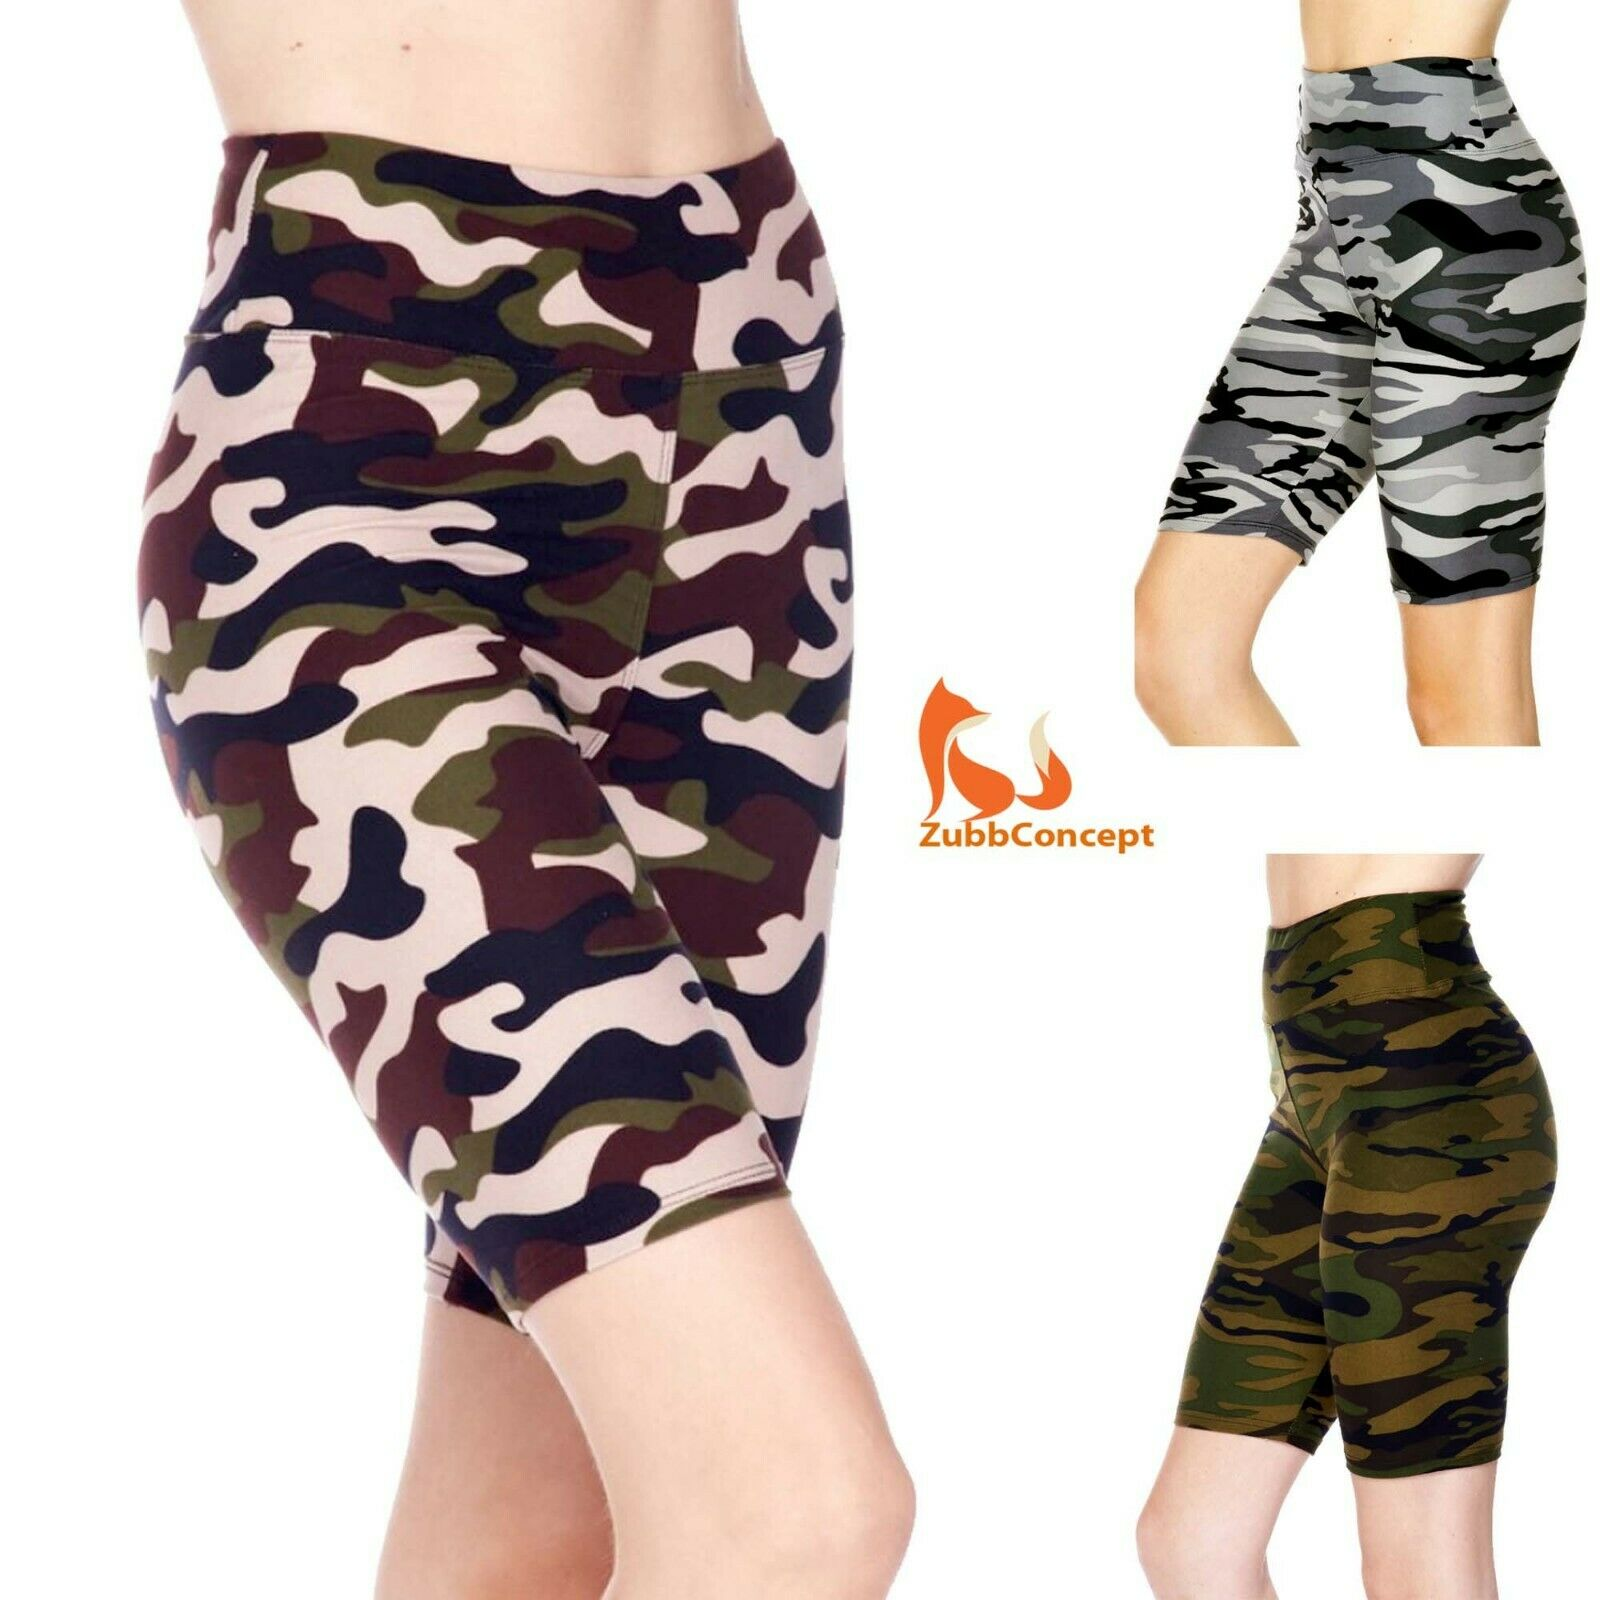 Women's Camouflage Printed 3 inch Wide Waistband Biker Leggi